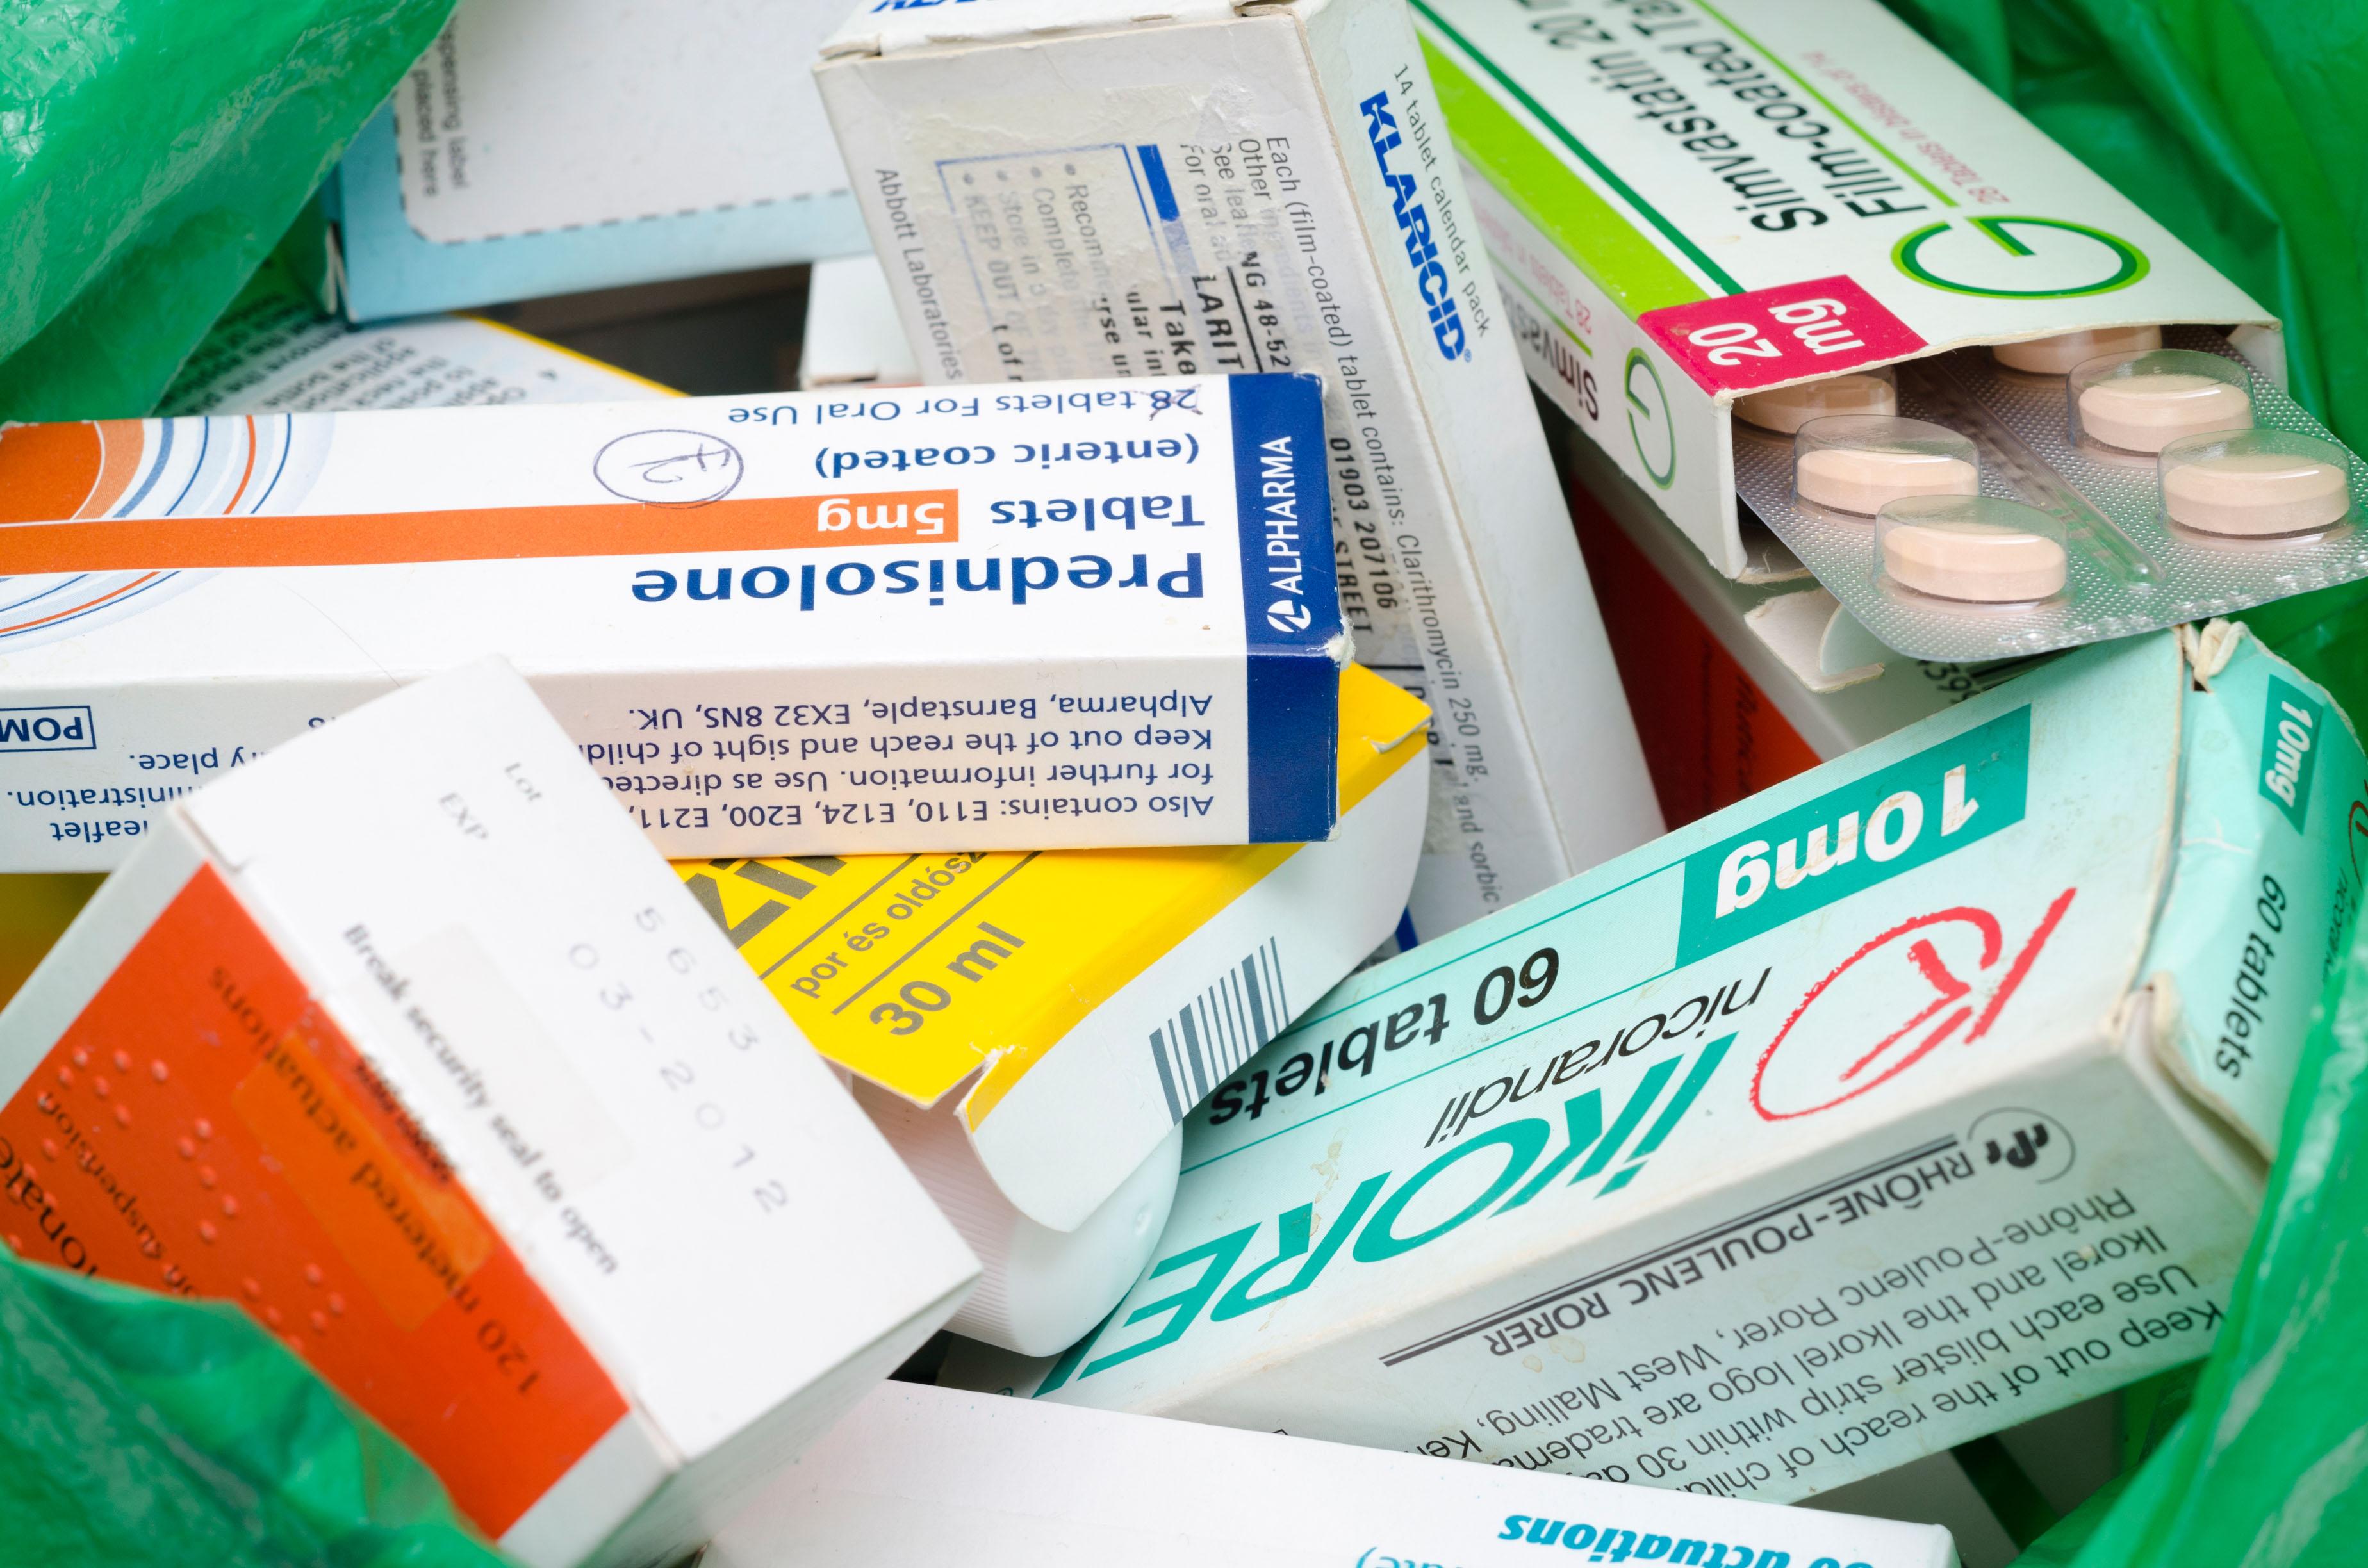 farmaci Olycom da archivio